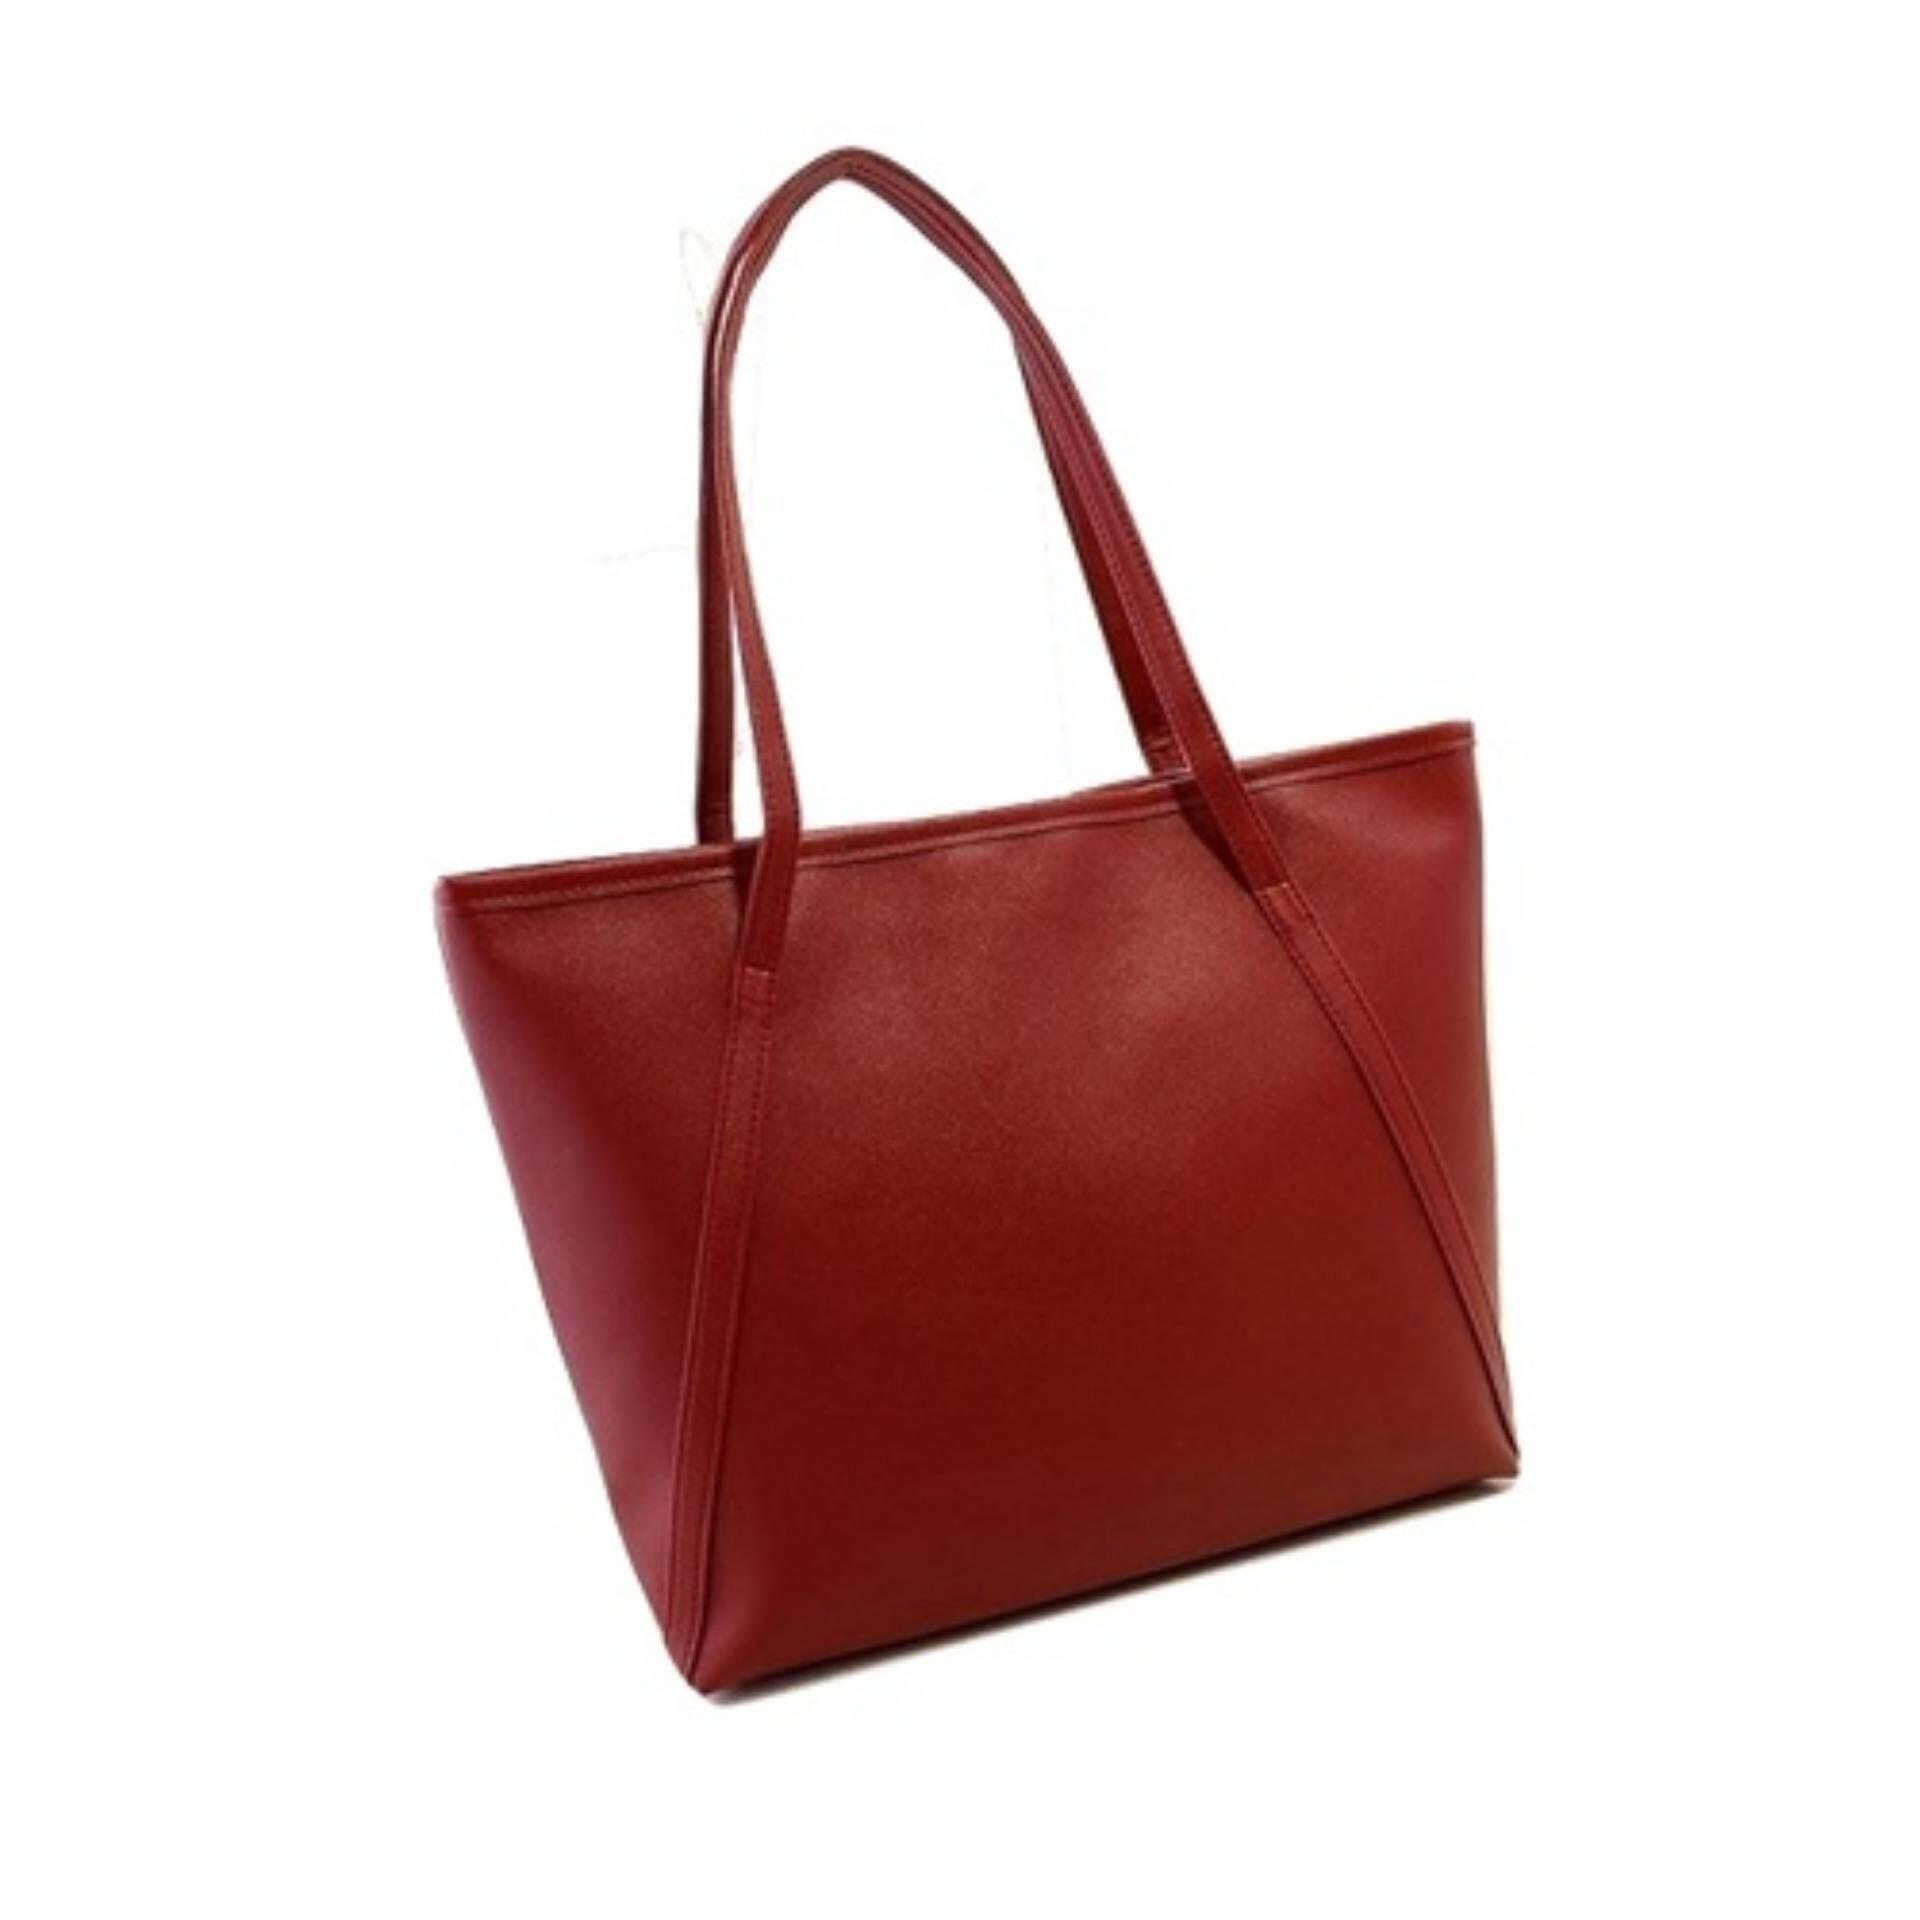 bfd311177d7 TEEMI Elegant Korean Style PU Leather Large Tote Bag Women Fashion Handbag  Shoulder Bag - Maroon